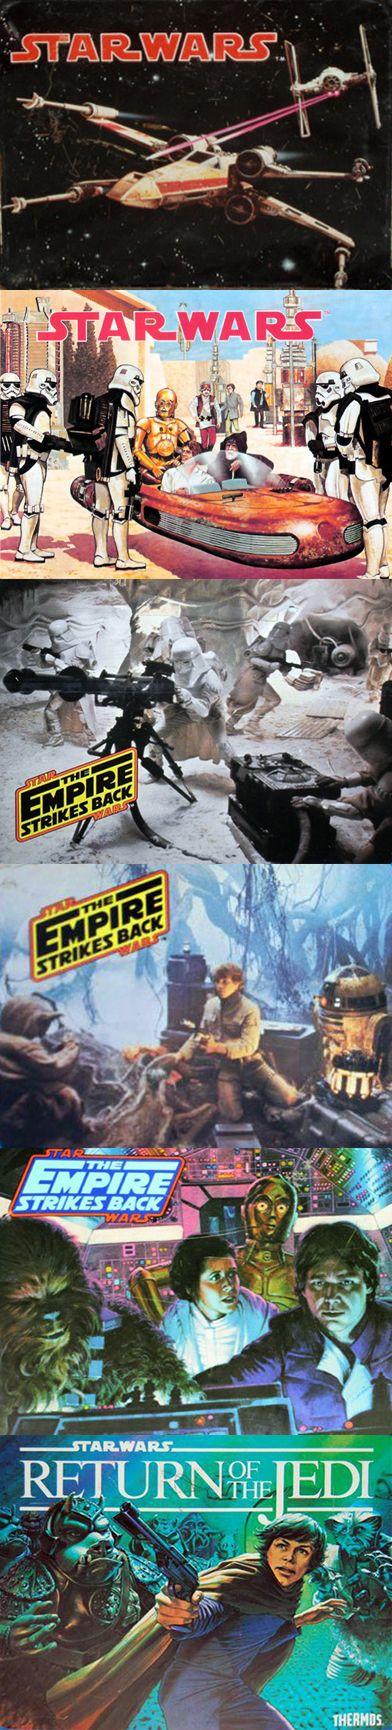 Star Wars Lunch Boxes & Best 25+ Star wars lunch box ideas on Pinterest | Lunch box jokes ... Aboutintivar.Com